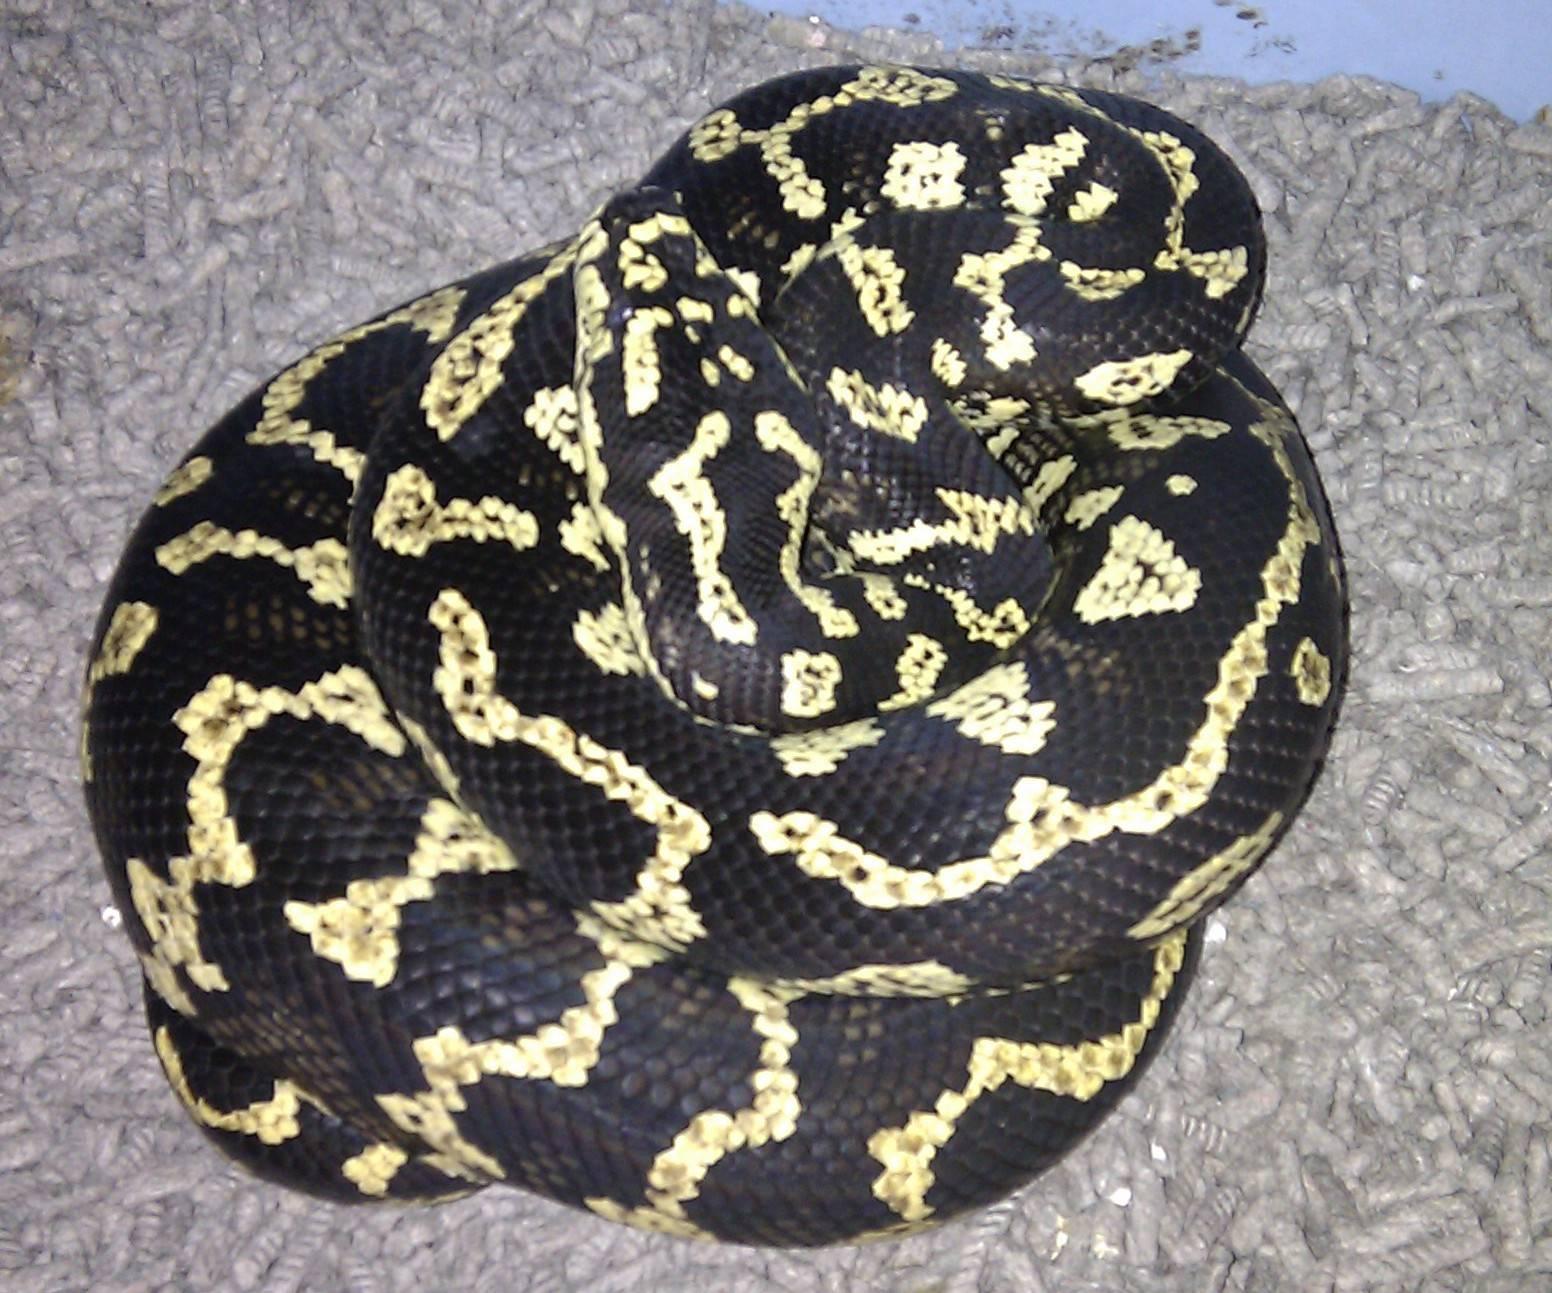 Jungle Carpet - Palmerston Female #2